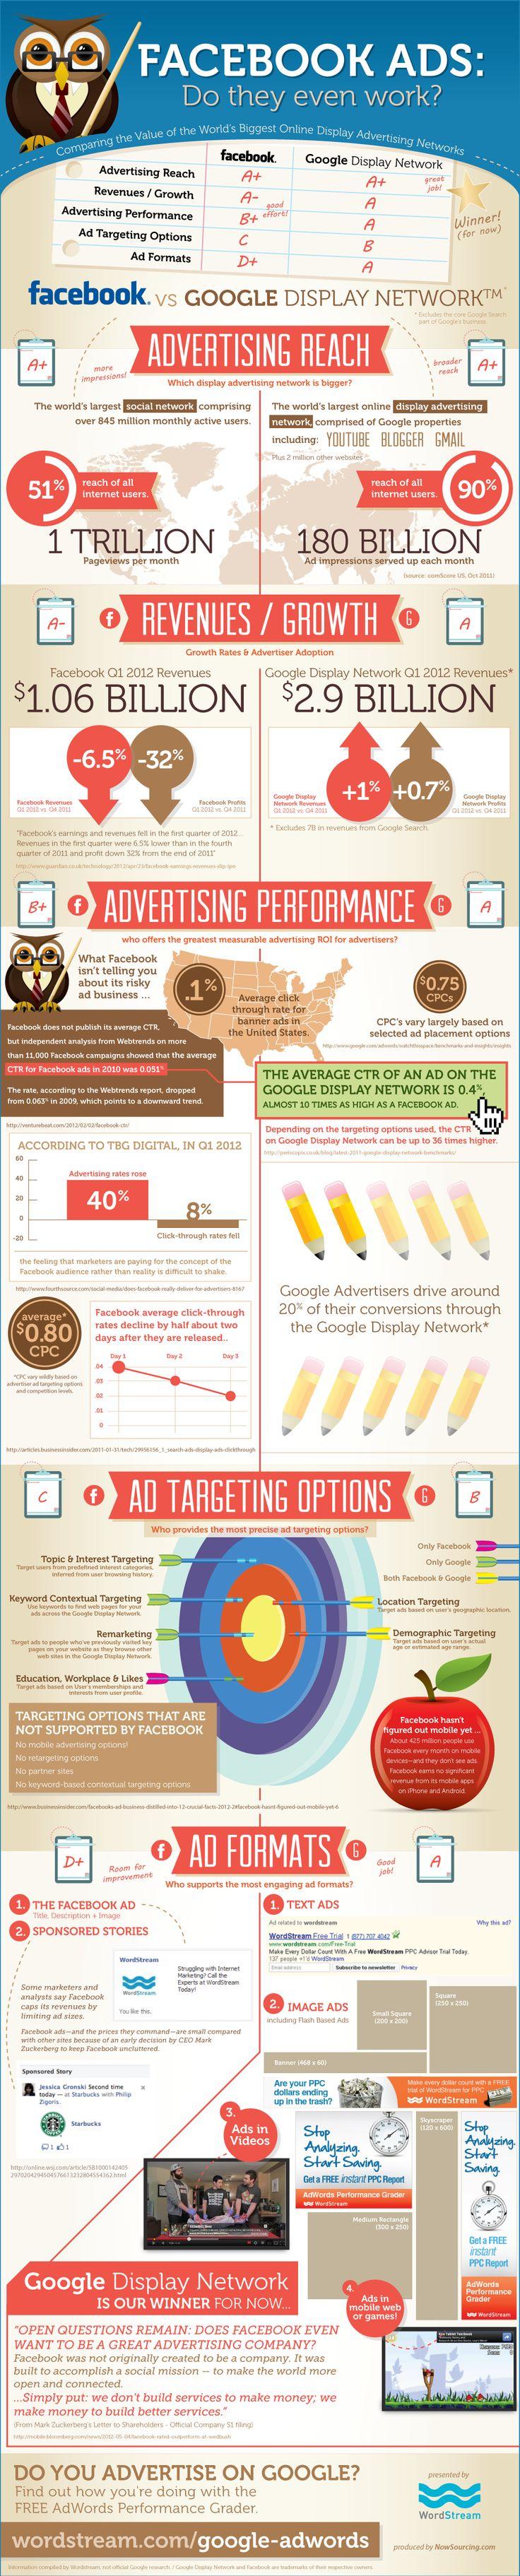 Facebook vs. Google. #infographic #facebook #google #adv #advertising